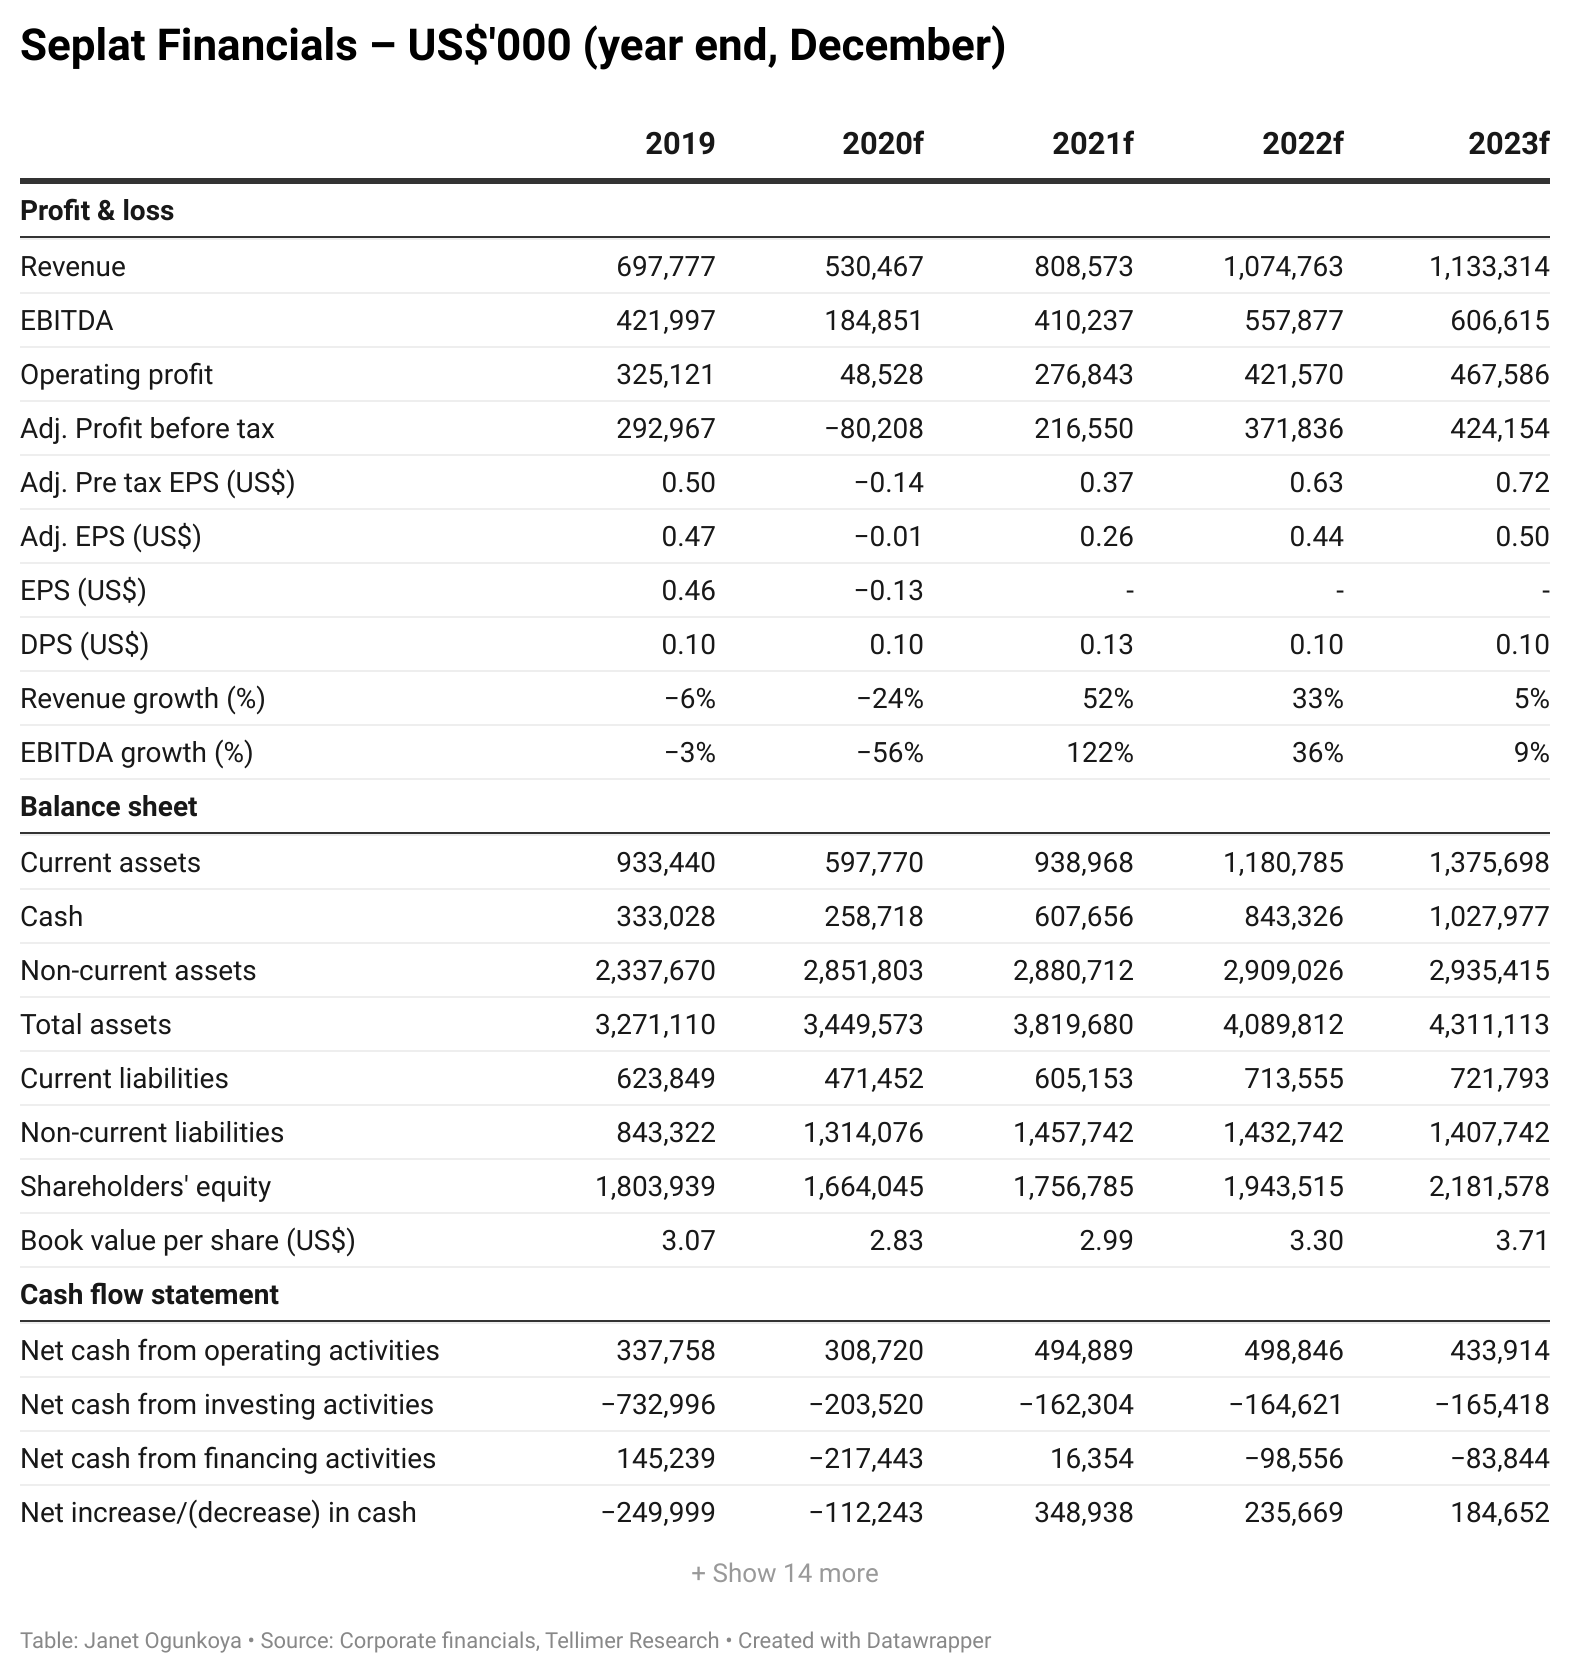 Seplat Financials – US$'000 (year end, December)